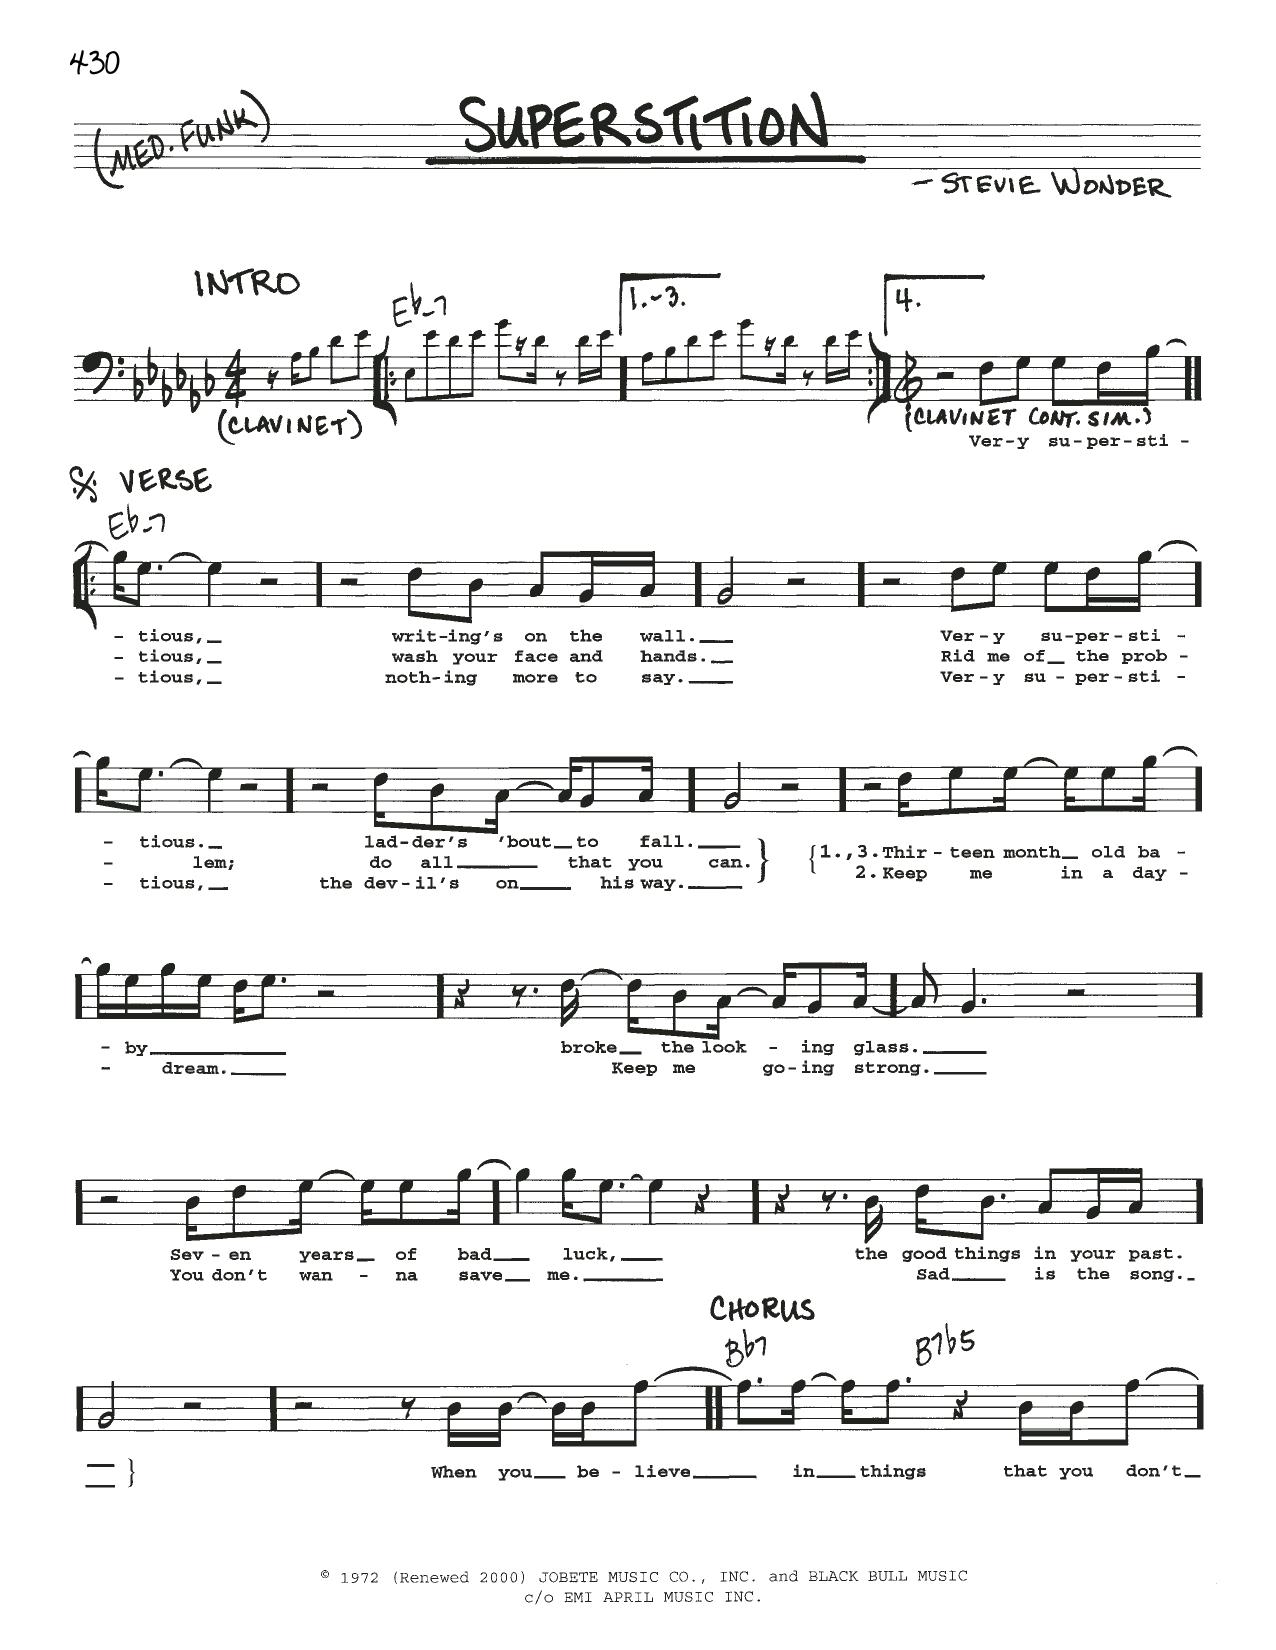 Superstition sheet music